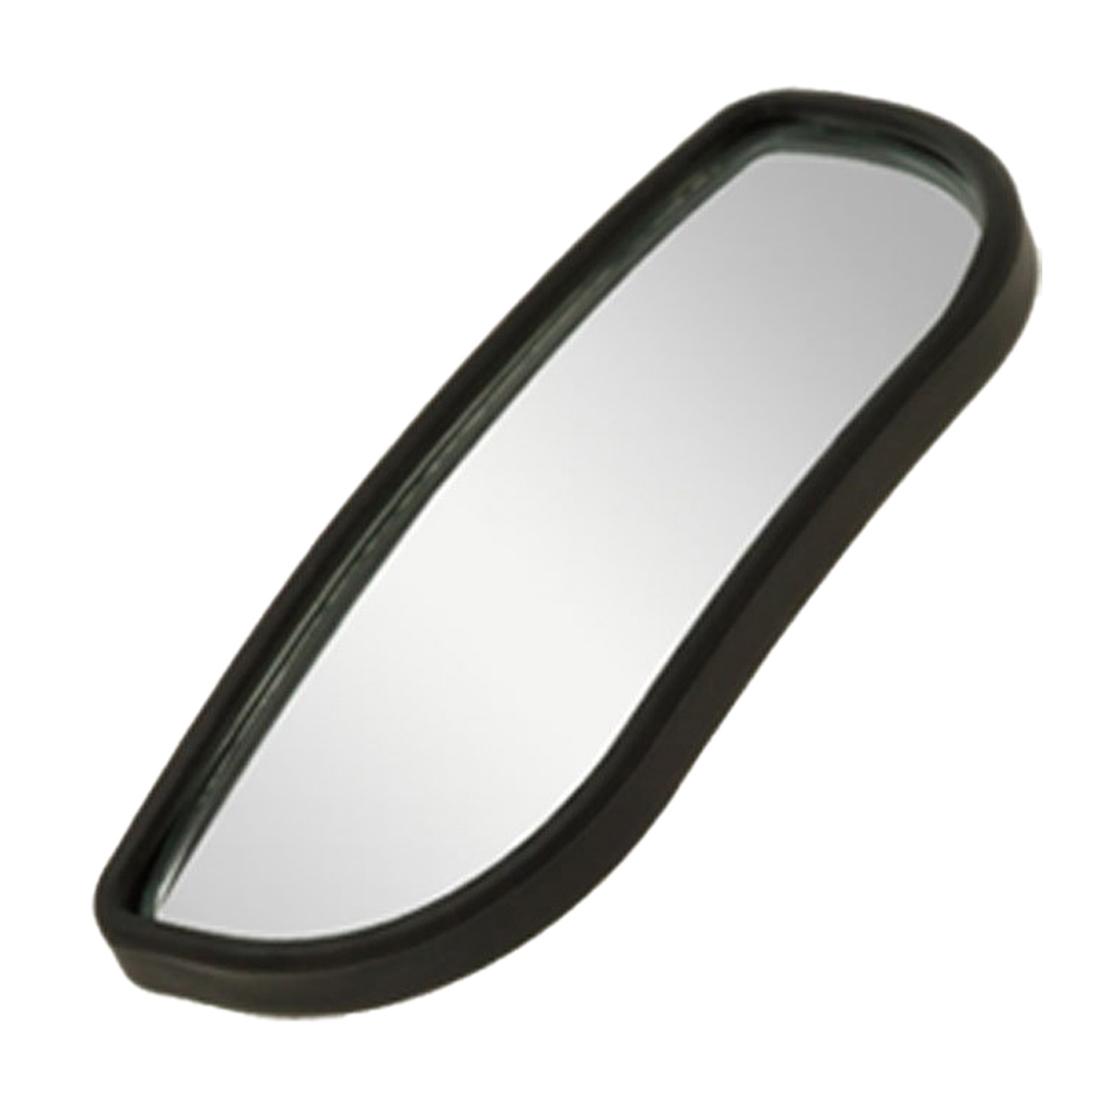 Ободки на боковые зеркала, Зеркала 2 зеркала